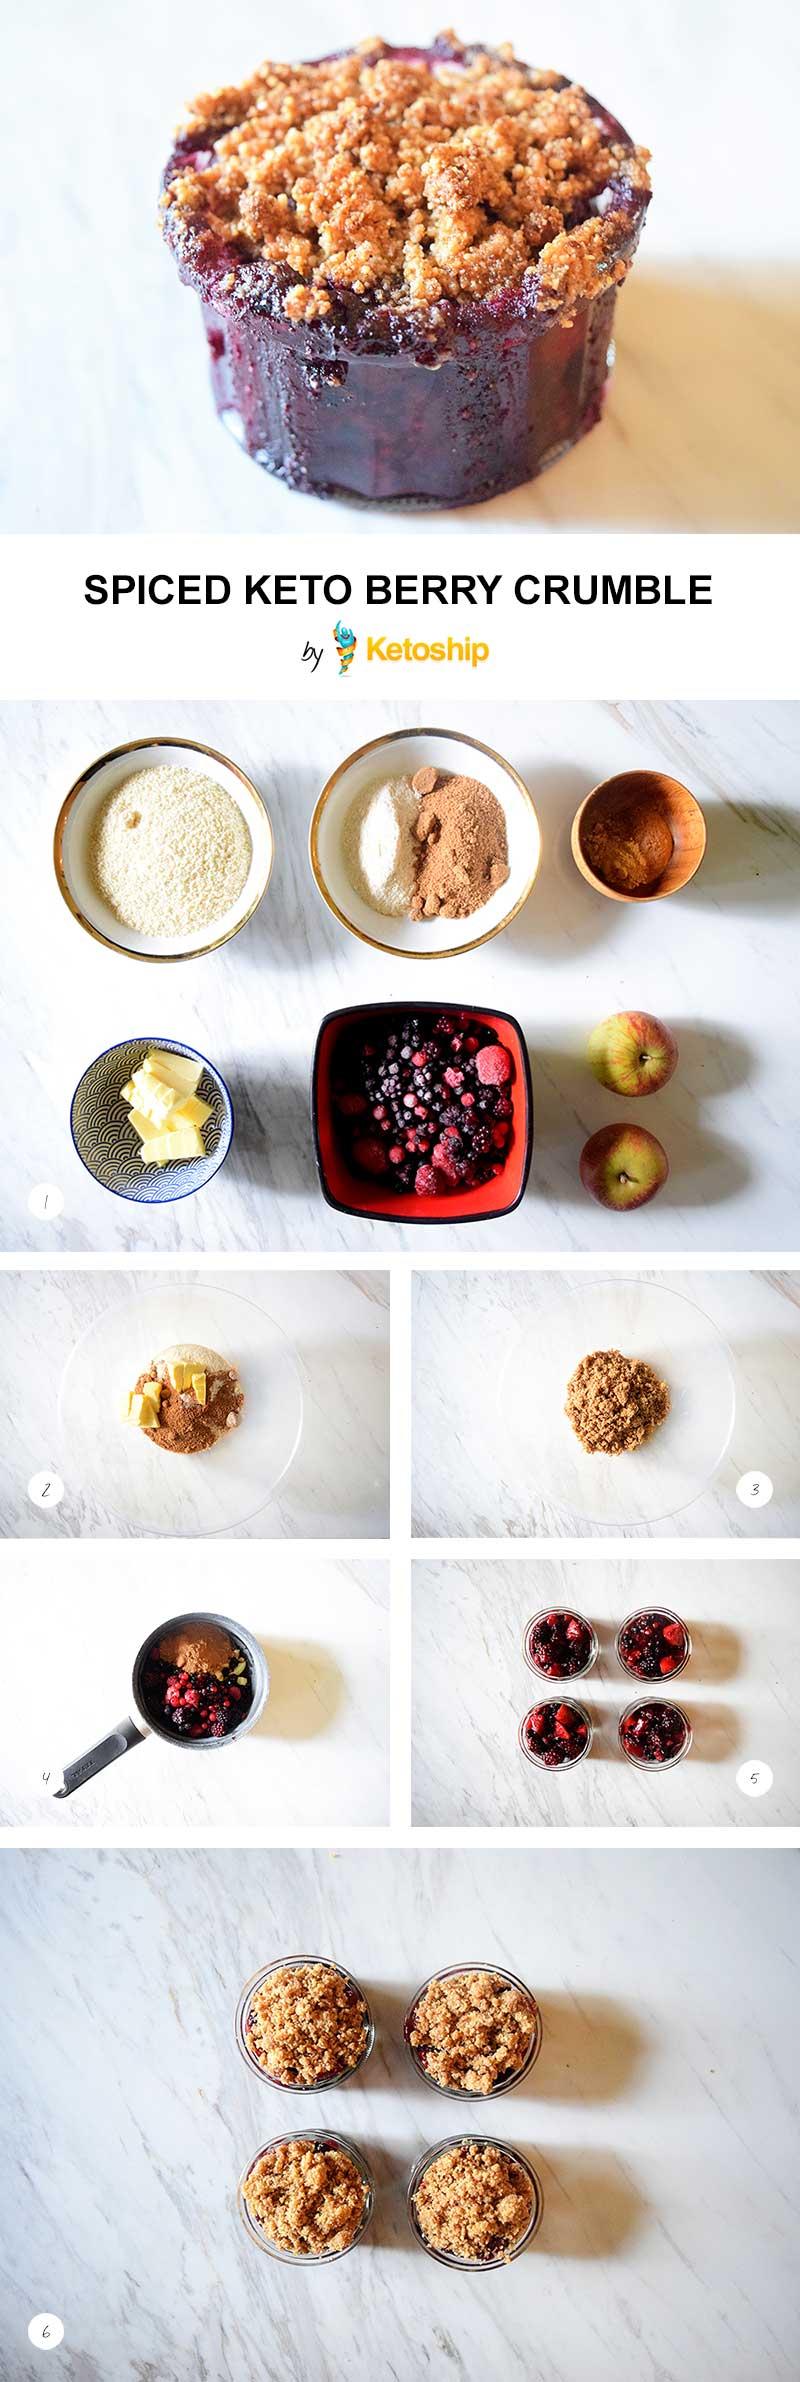 Spiced Keto Berry Crumble Recipe   Ketoship